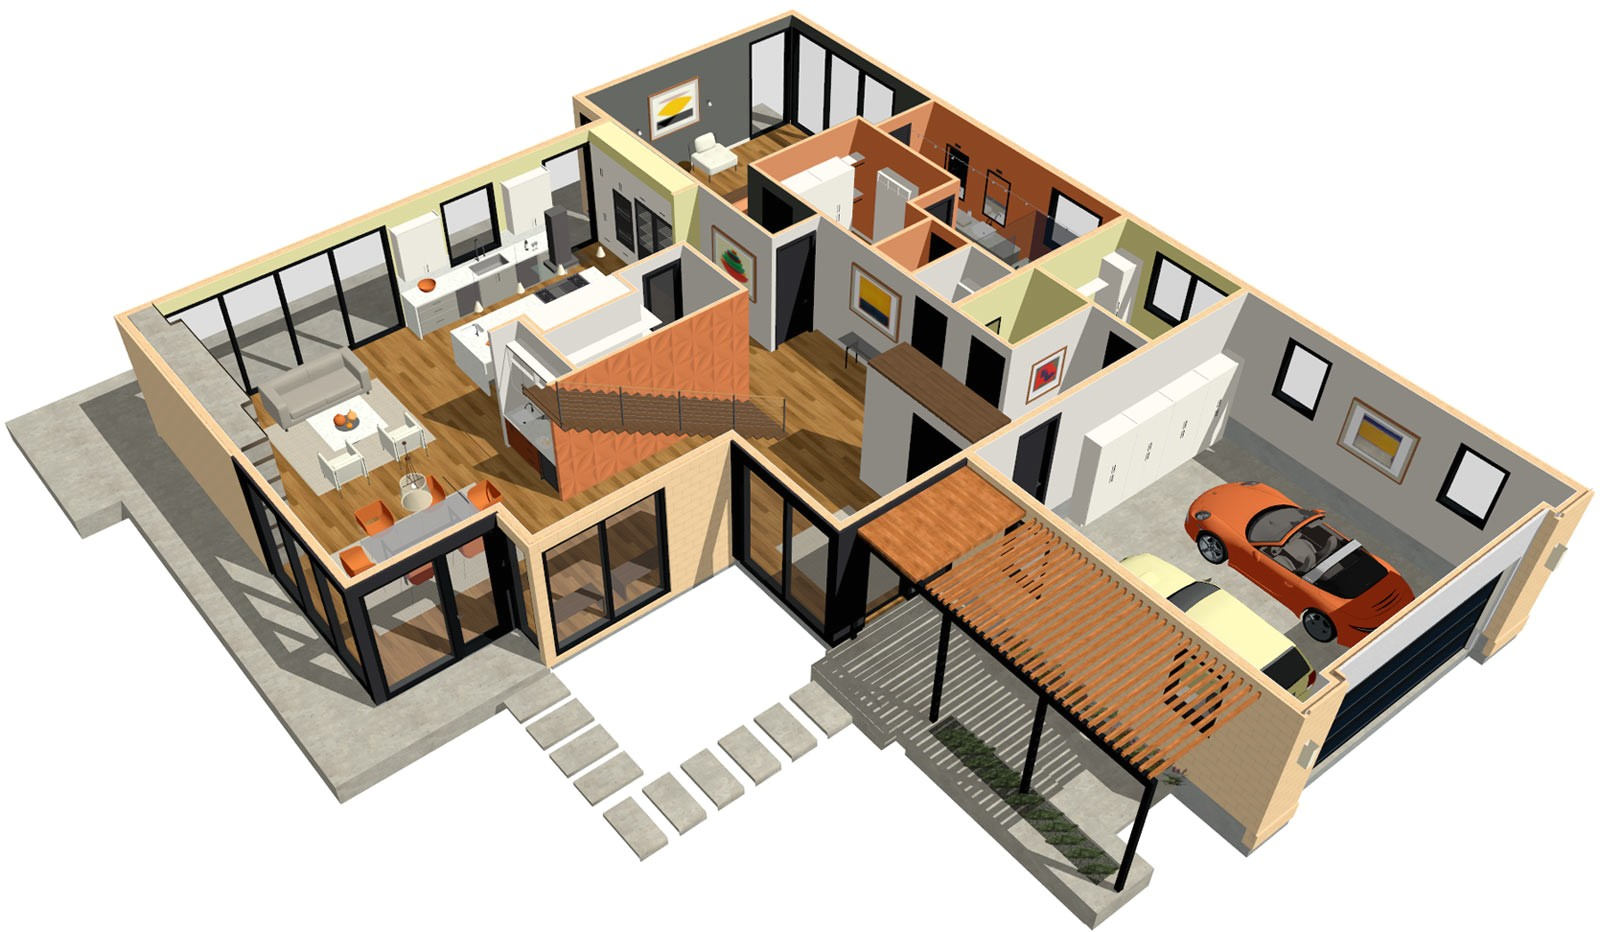 Architect Designed Home Plans Architecture for Home Design Homes Floor Plans